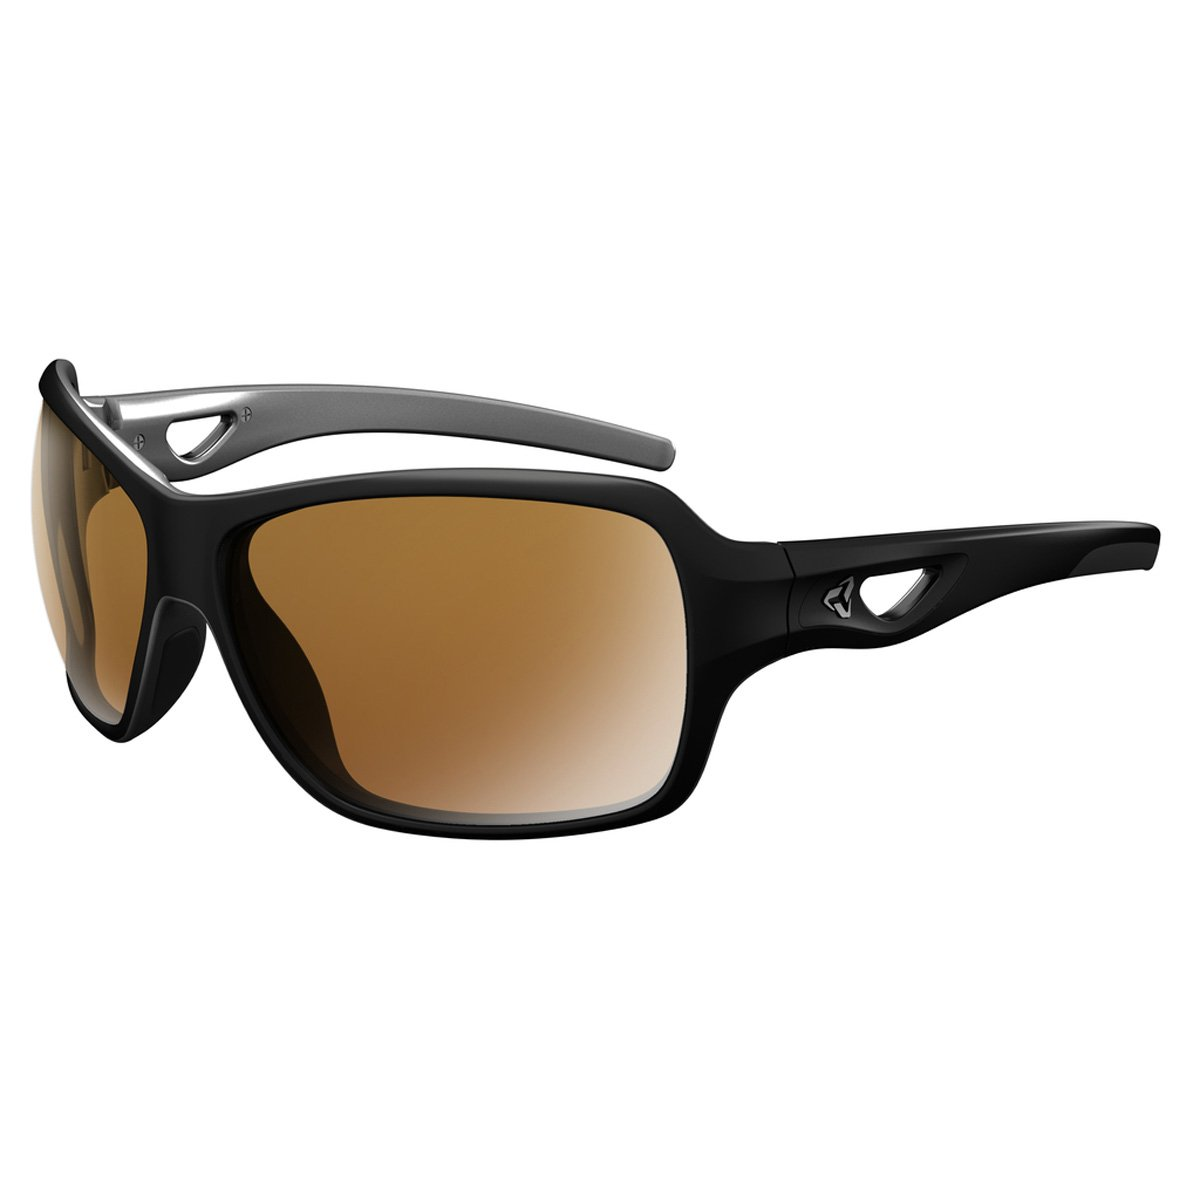 Ryders Eyewear Carlita偏光サングラス  POLAR BLACK-SILVER / BROWN LENS SILVER FM B01E81CSJW